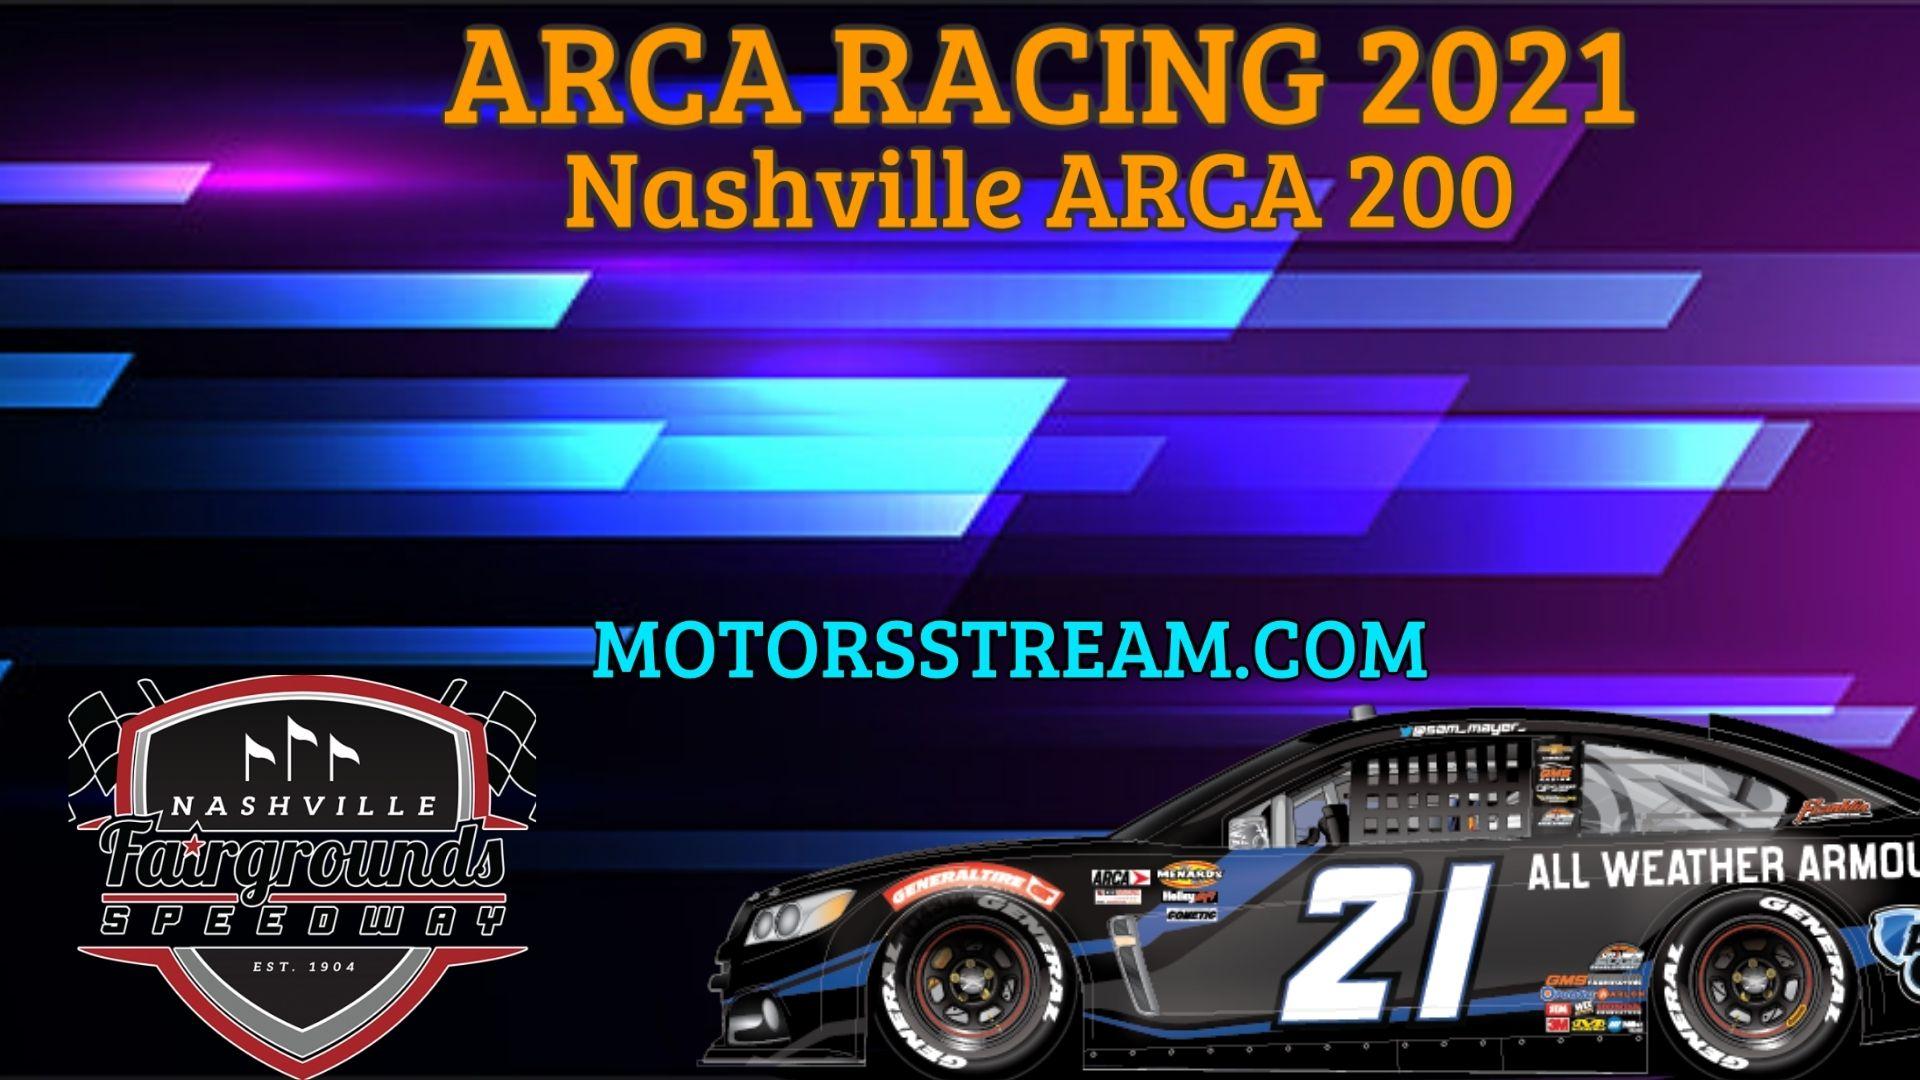 Nashville ARCA 200 Live Stream 2021 Arca Racing